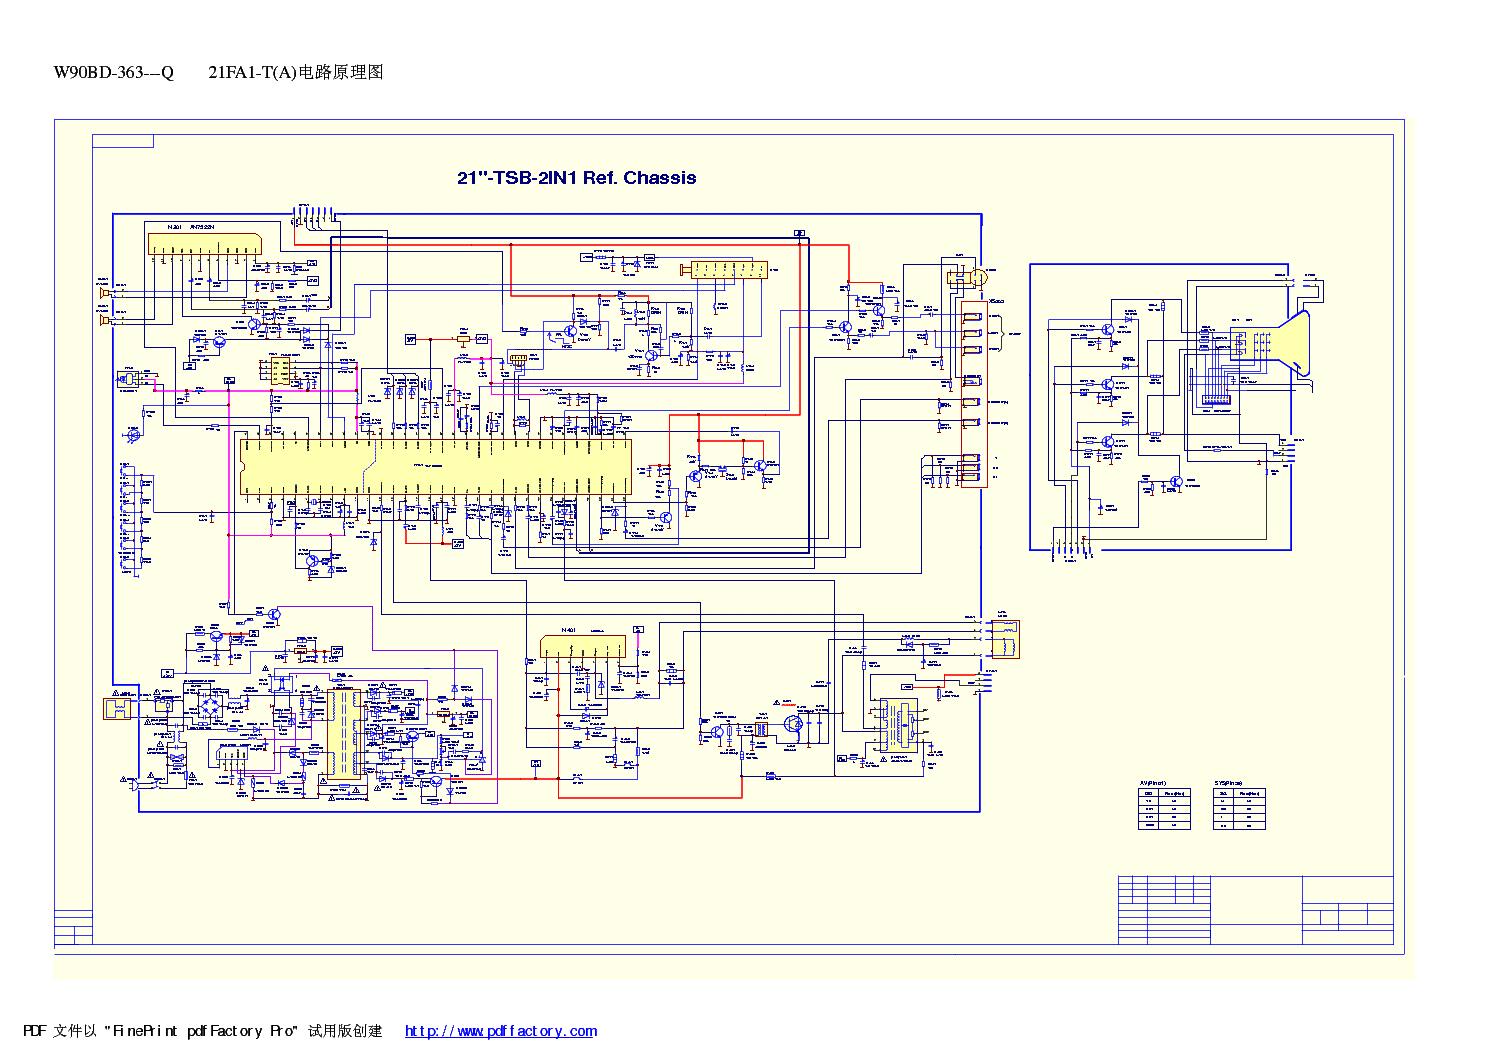 Haier Hs2168 Lc864512 La7688 An5265 La7837 Tv D Sch Lcd Schematic Diagram Http Elektrotanyacom Bekotelchassis127